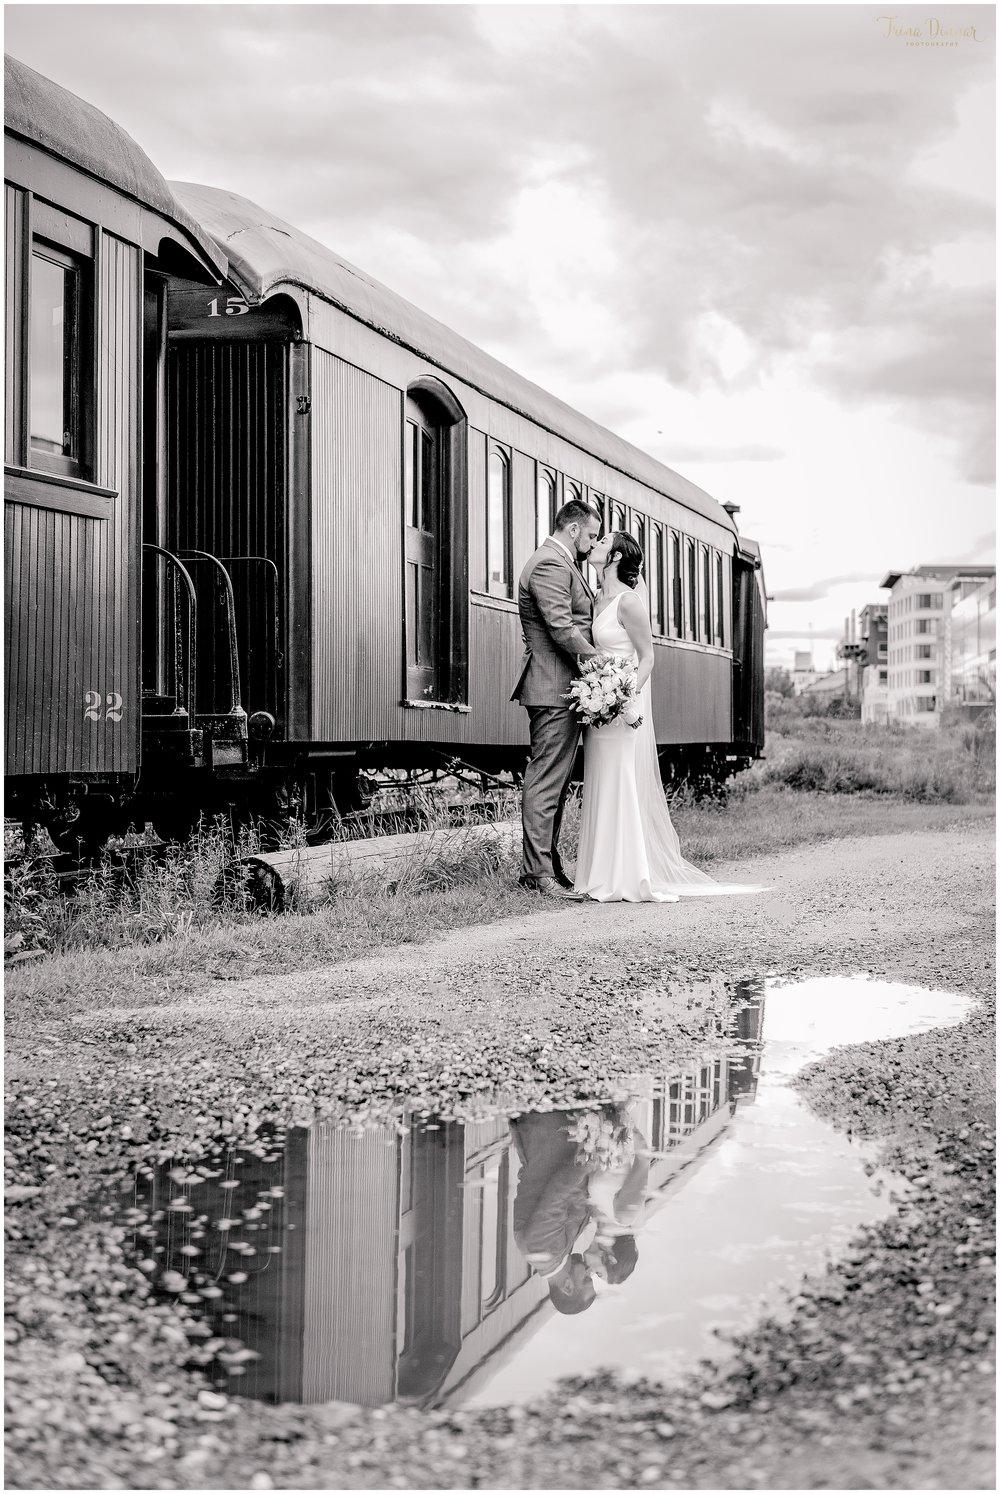 Lindsey and Chris' Portland Maine Train Wedding